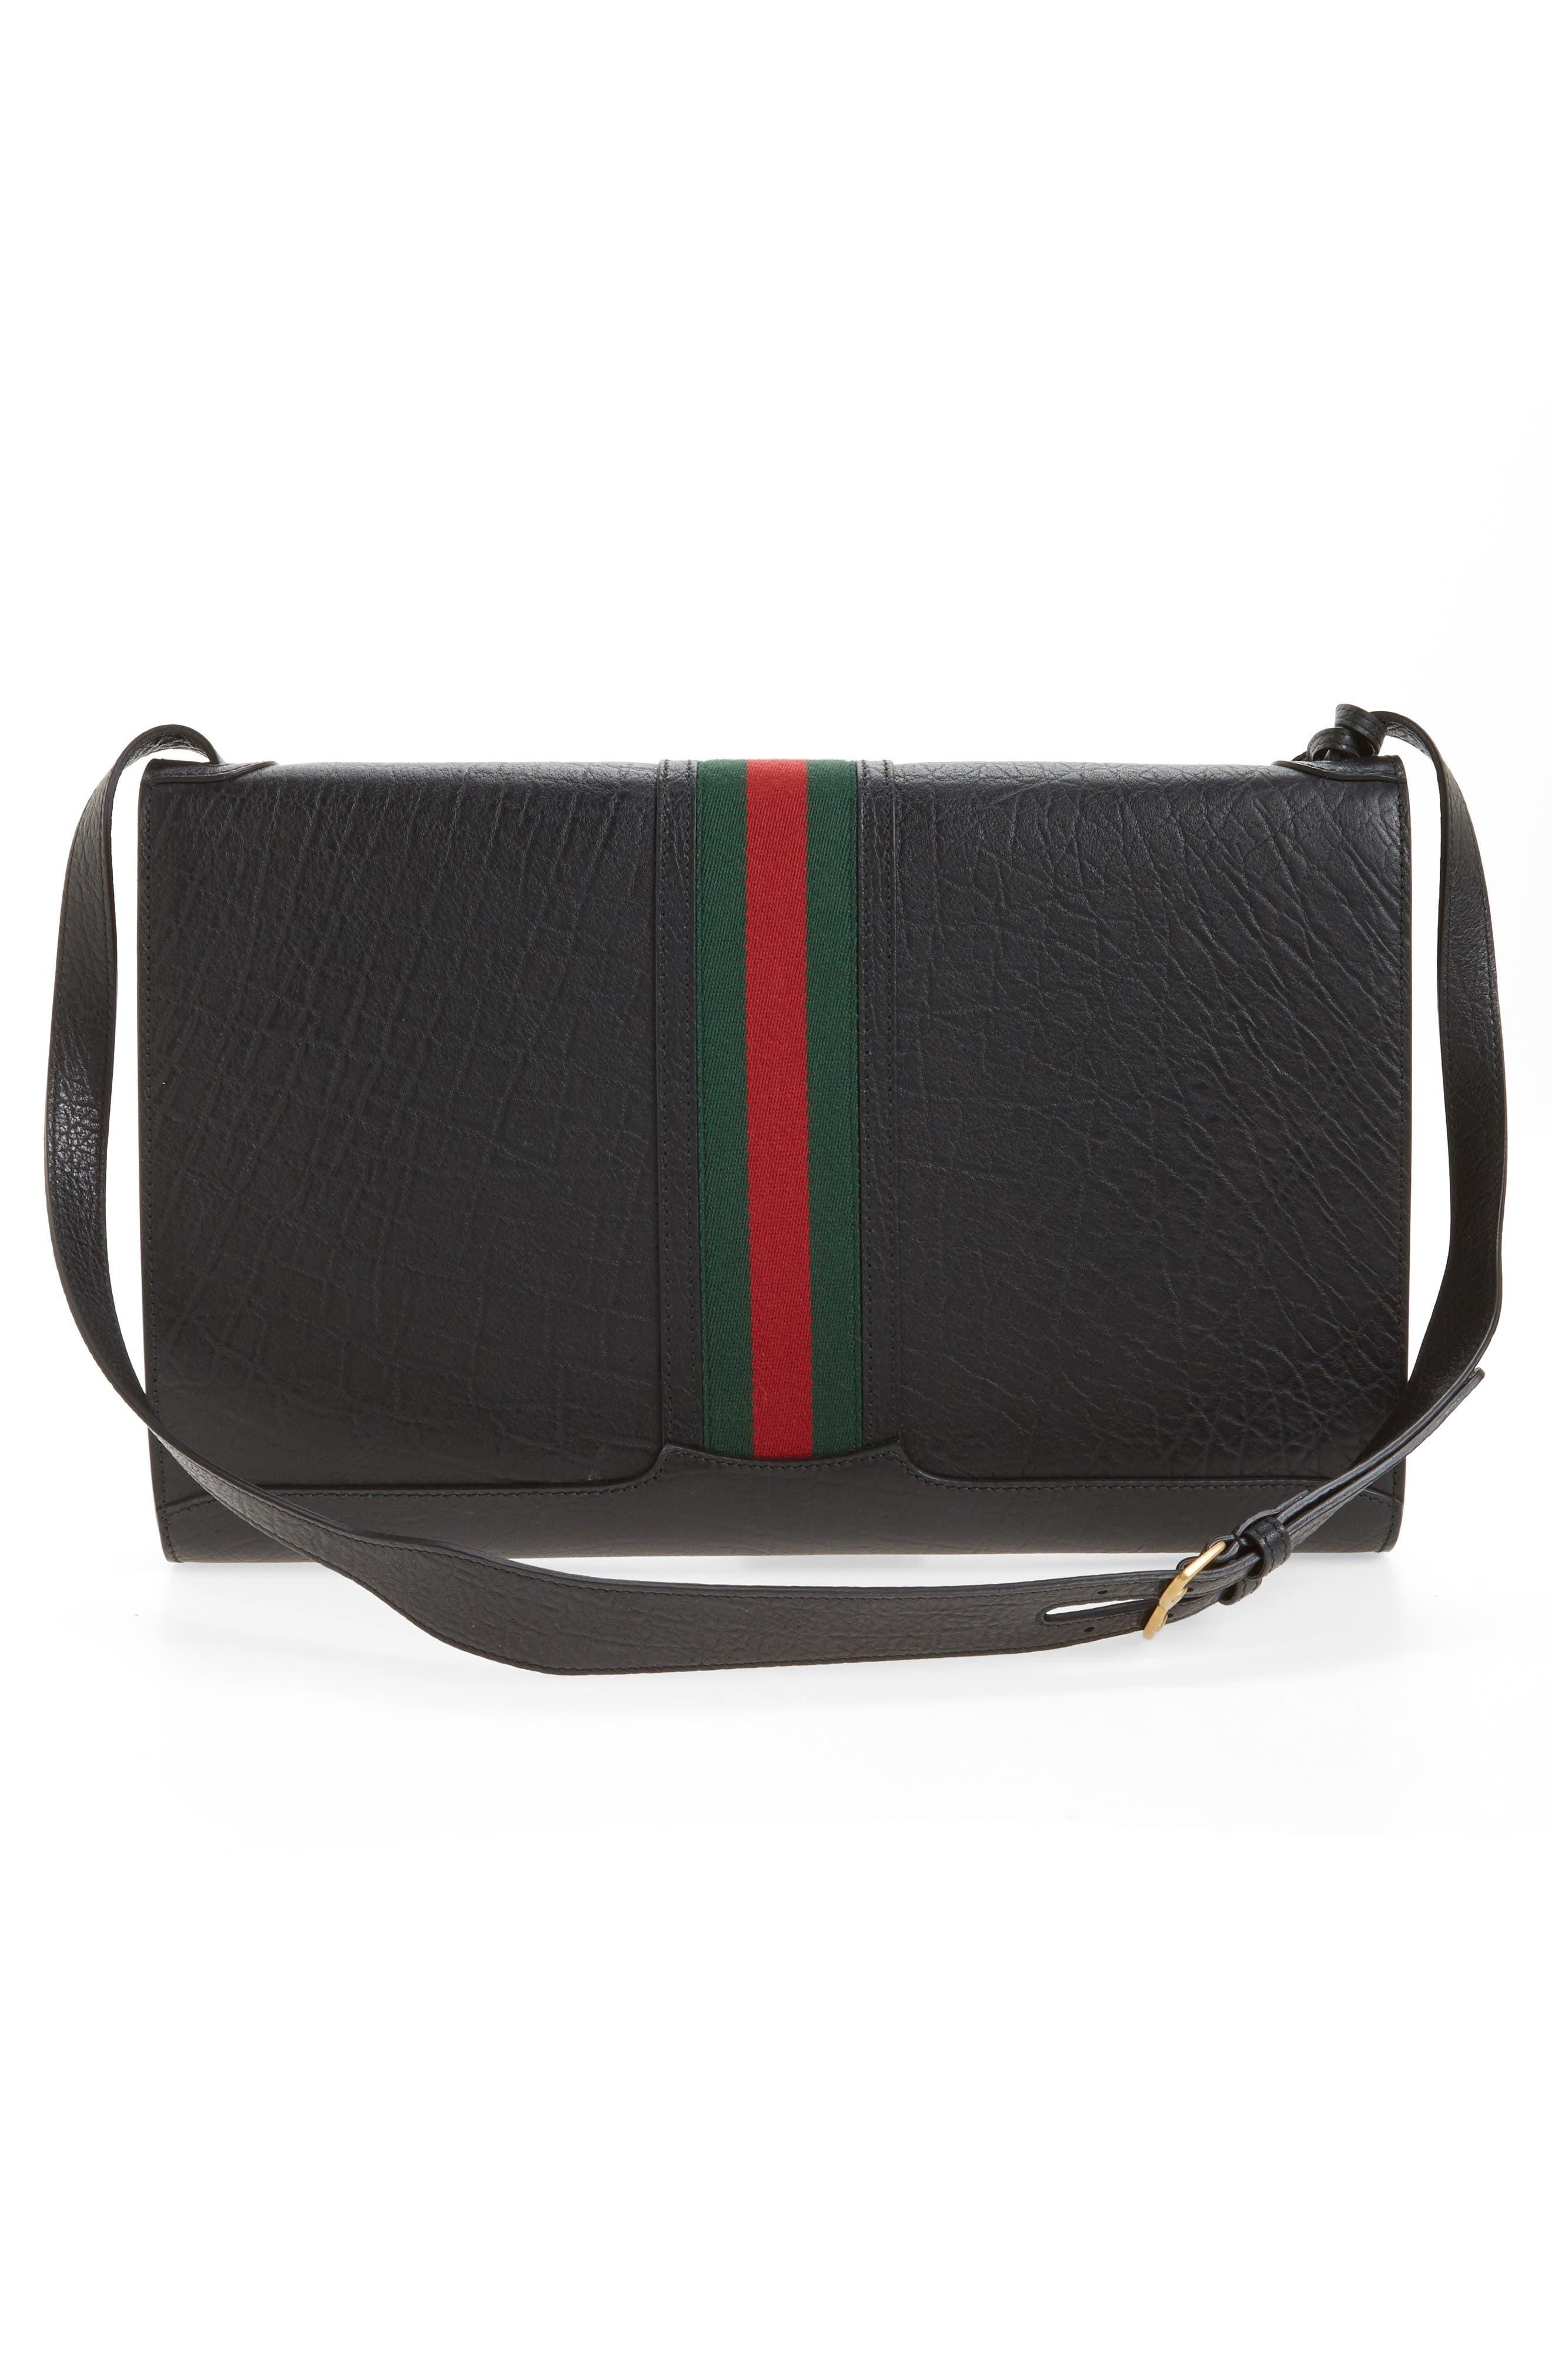 Neo Vintage Messenger Bag,                             Alternate thumbnail 3, color,                             Black Multi